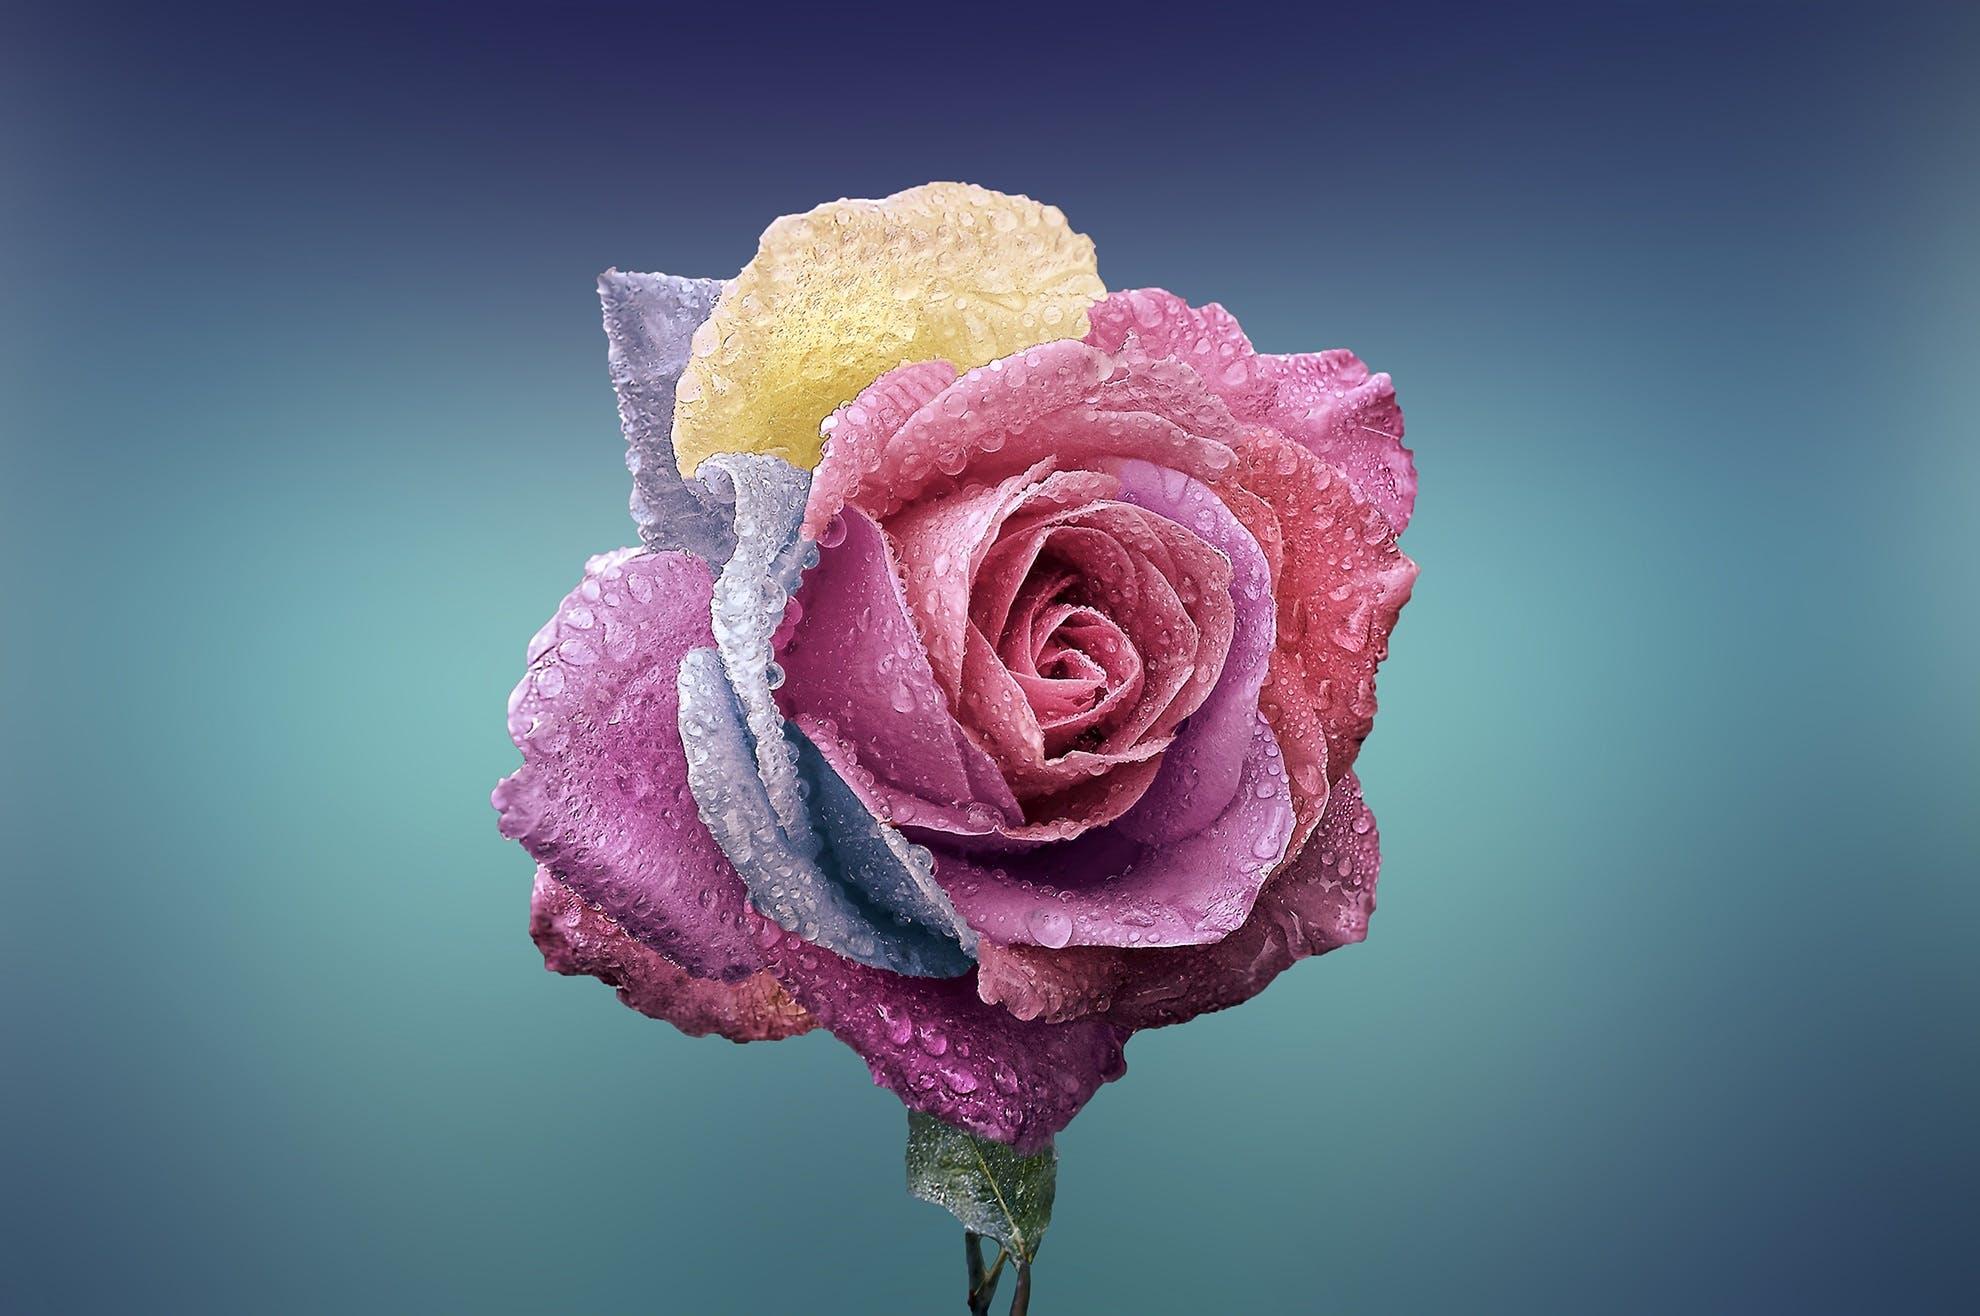 Free stock photo of flower, macro, rose, bloom